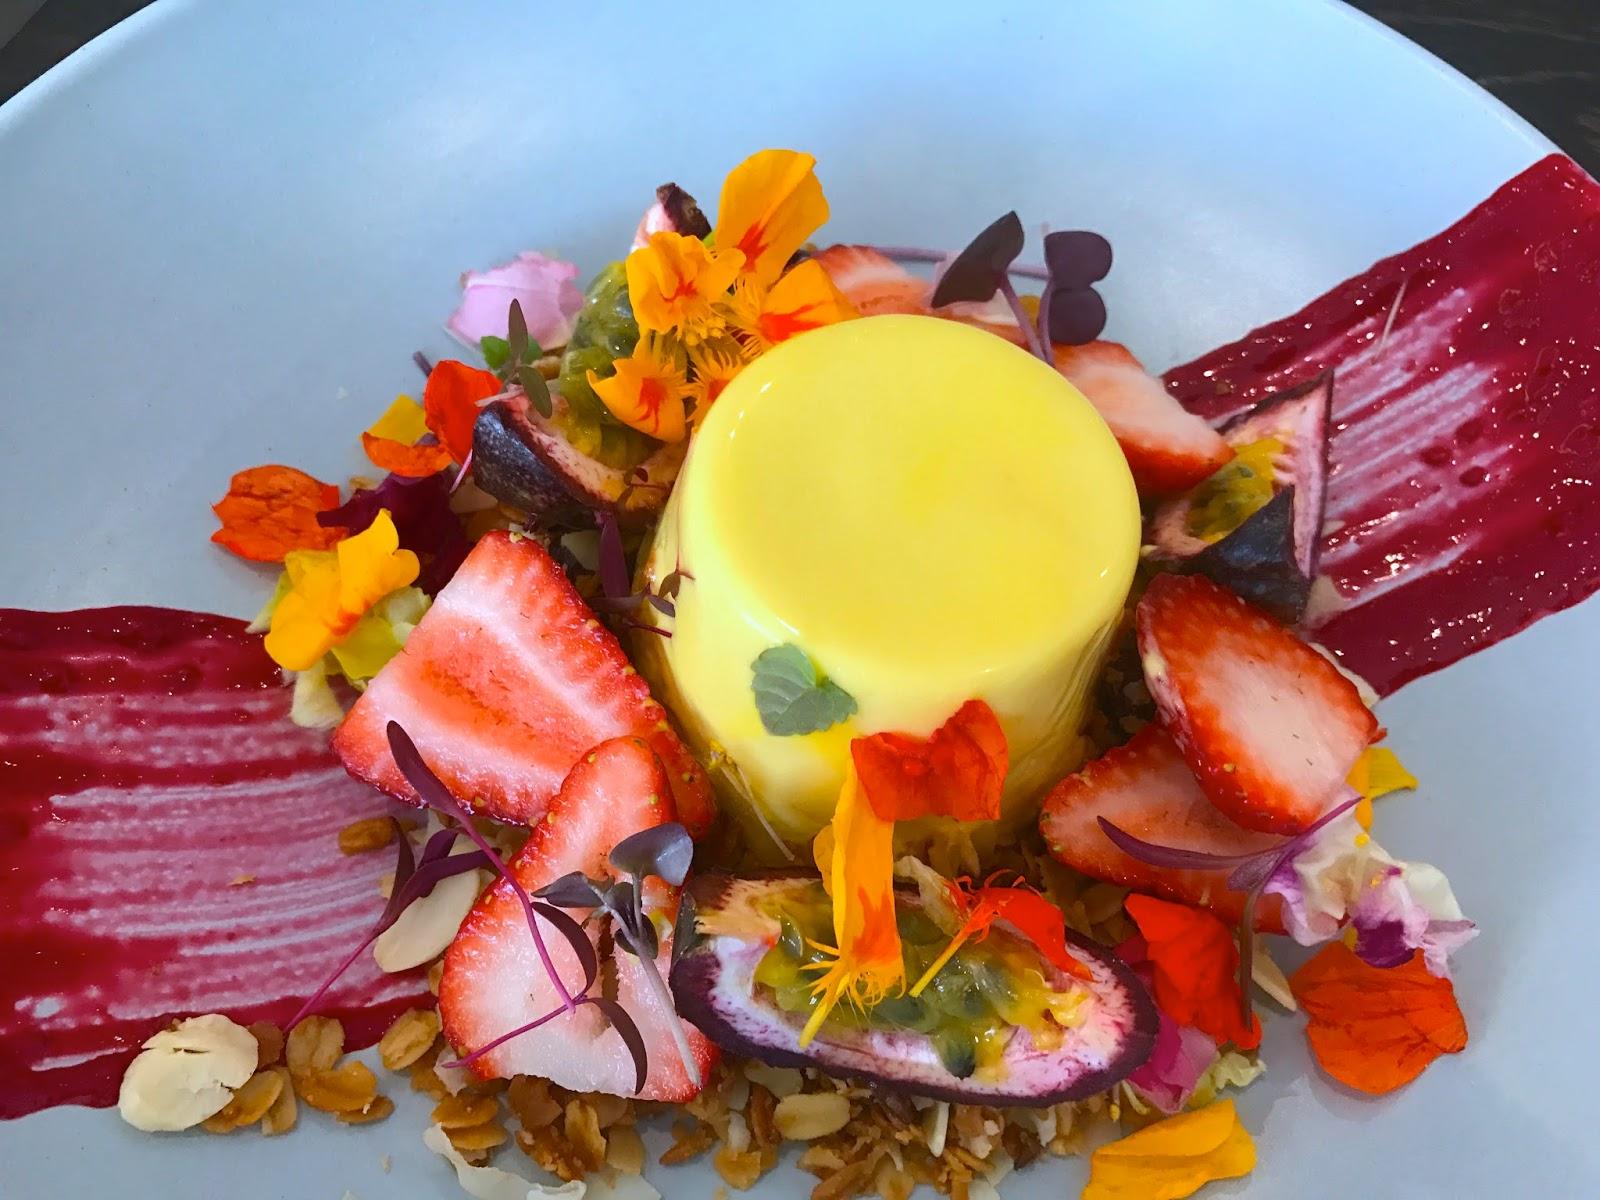 Cotta Cafe Melbourn : Tinker invited lips temptations